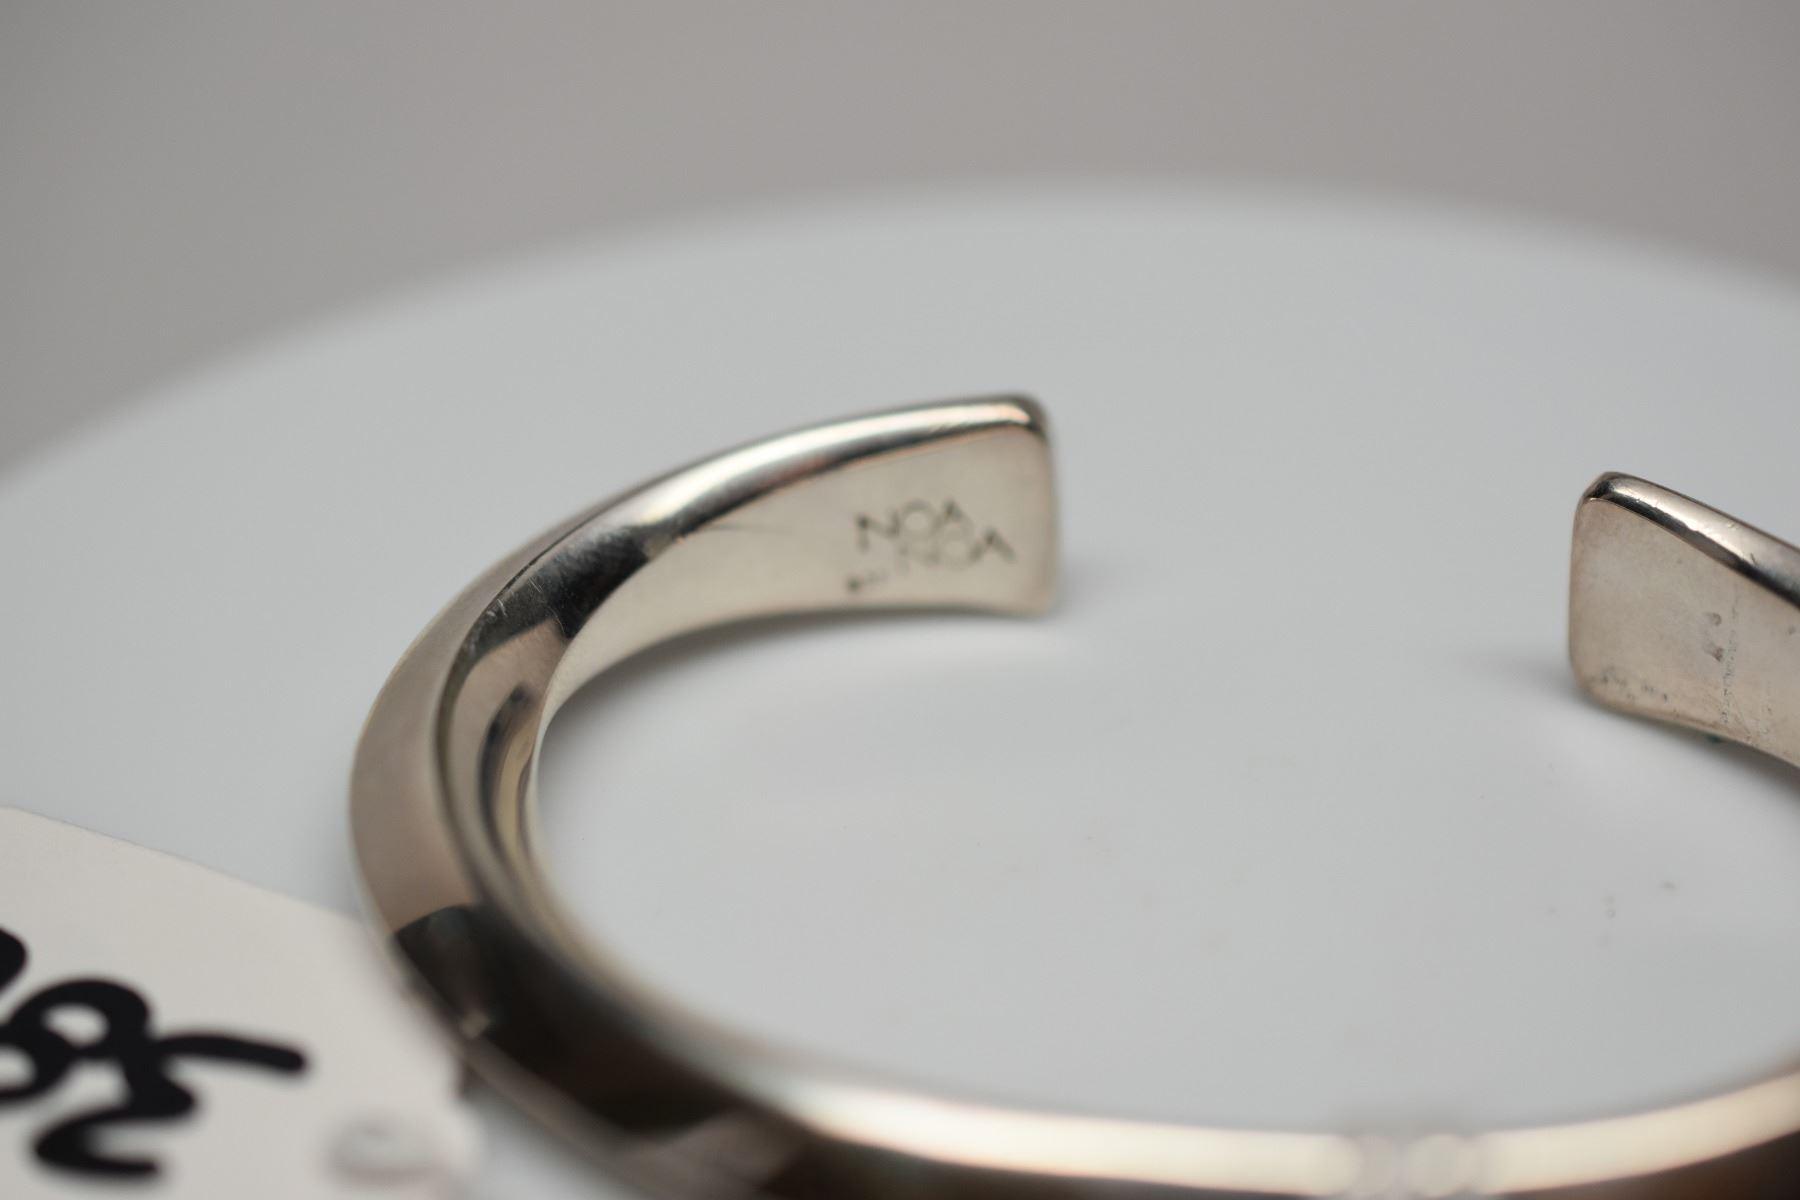 b39a1562f3409 Tiffany & Co. Sterling Silver Bracelet 2 1/2